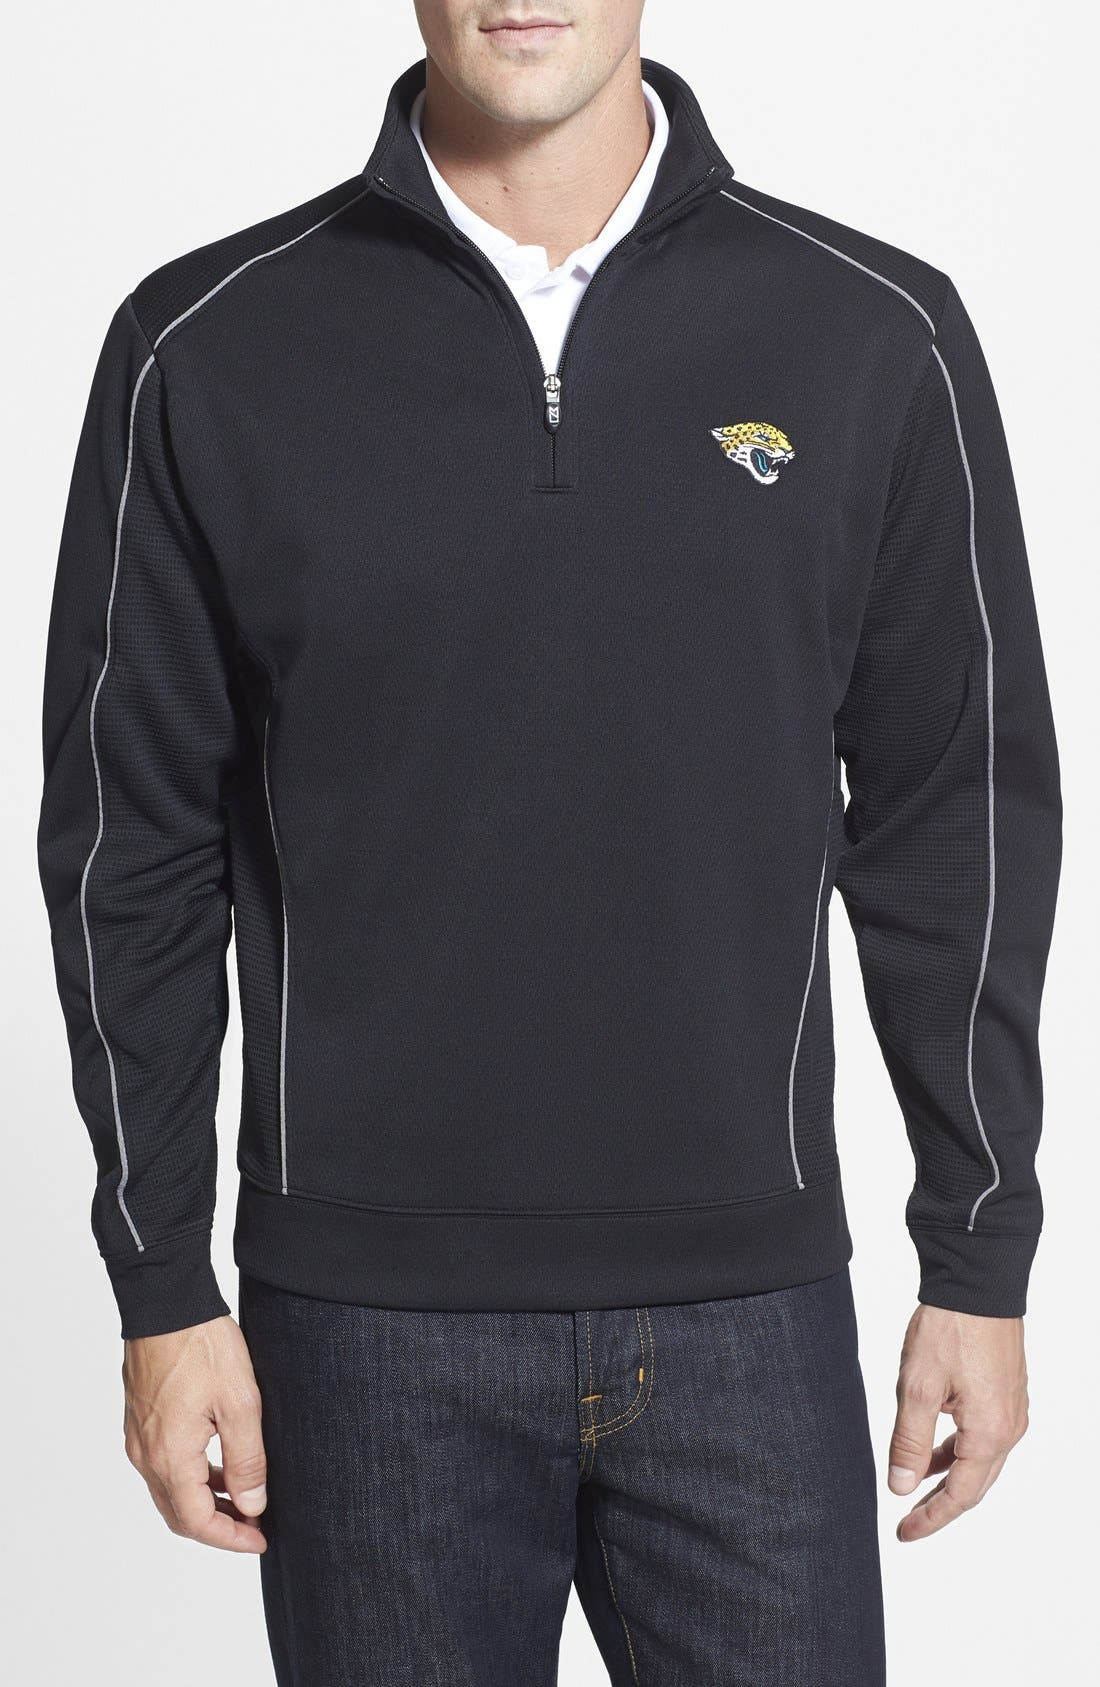 Cutter & Buck Jacksonville Jaguars - Edge DryTec Moisture Wicking Half Zip Pullover